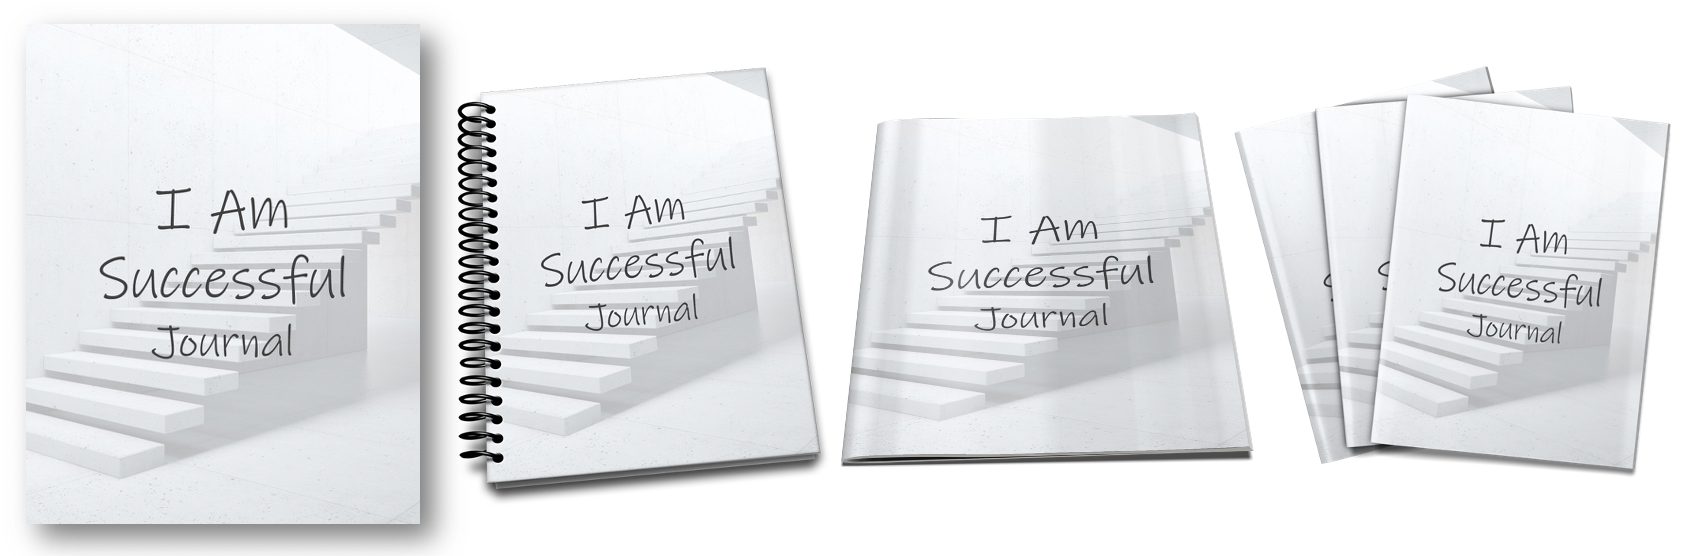 I Am Successful Journal Cover